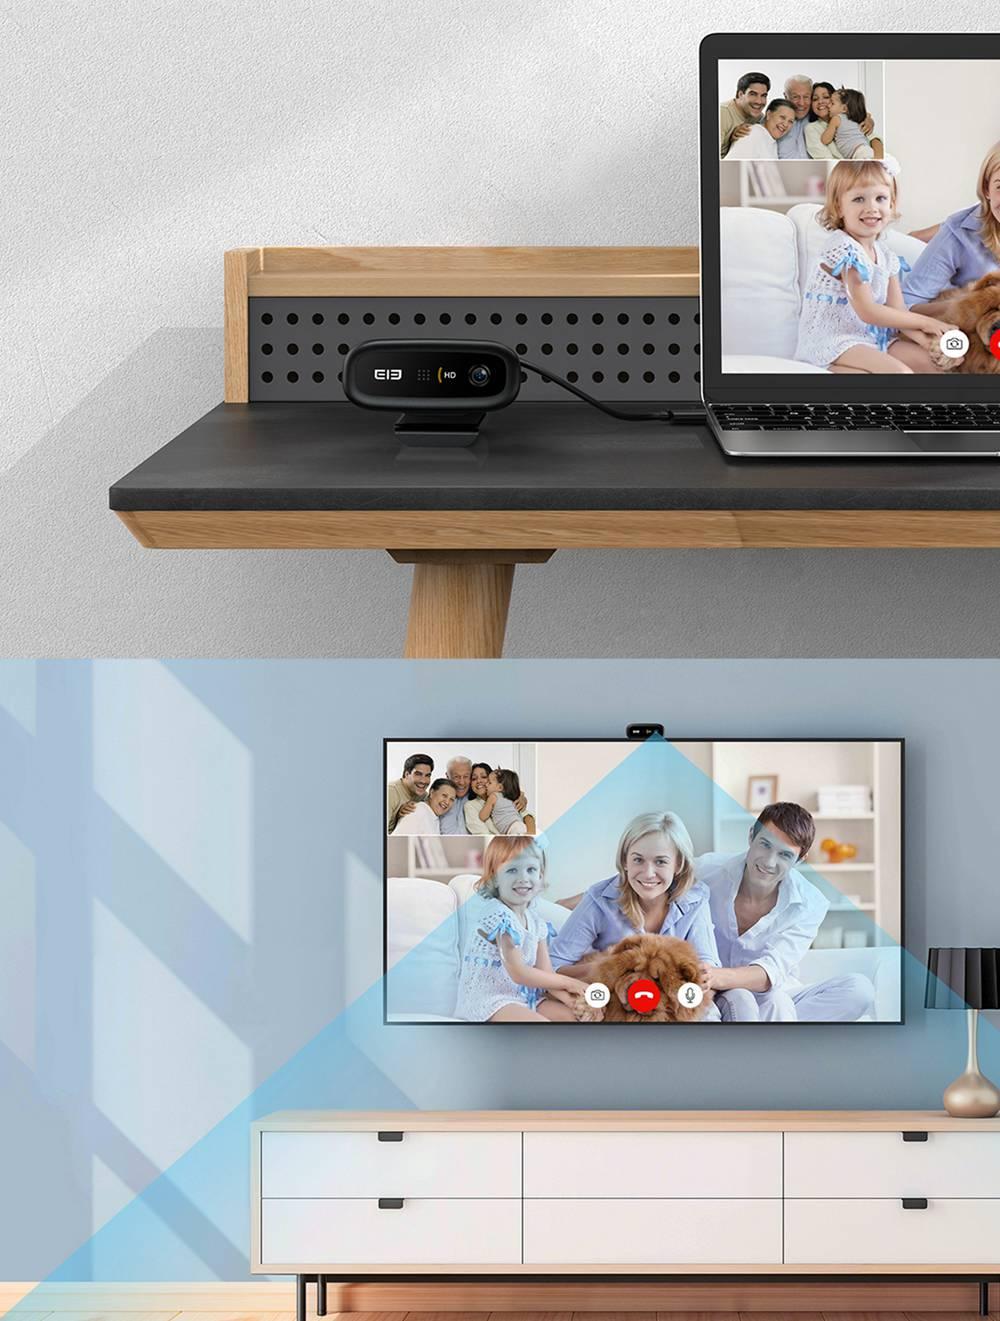 geekbuying Elephone Ecam X 1080P HD Webcam 5 0 MegaPixels Black 852902